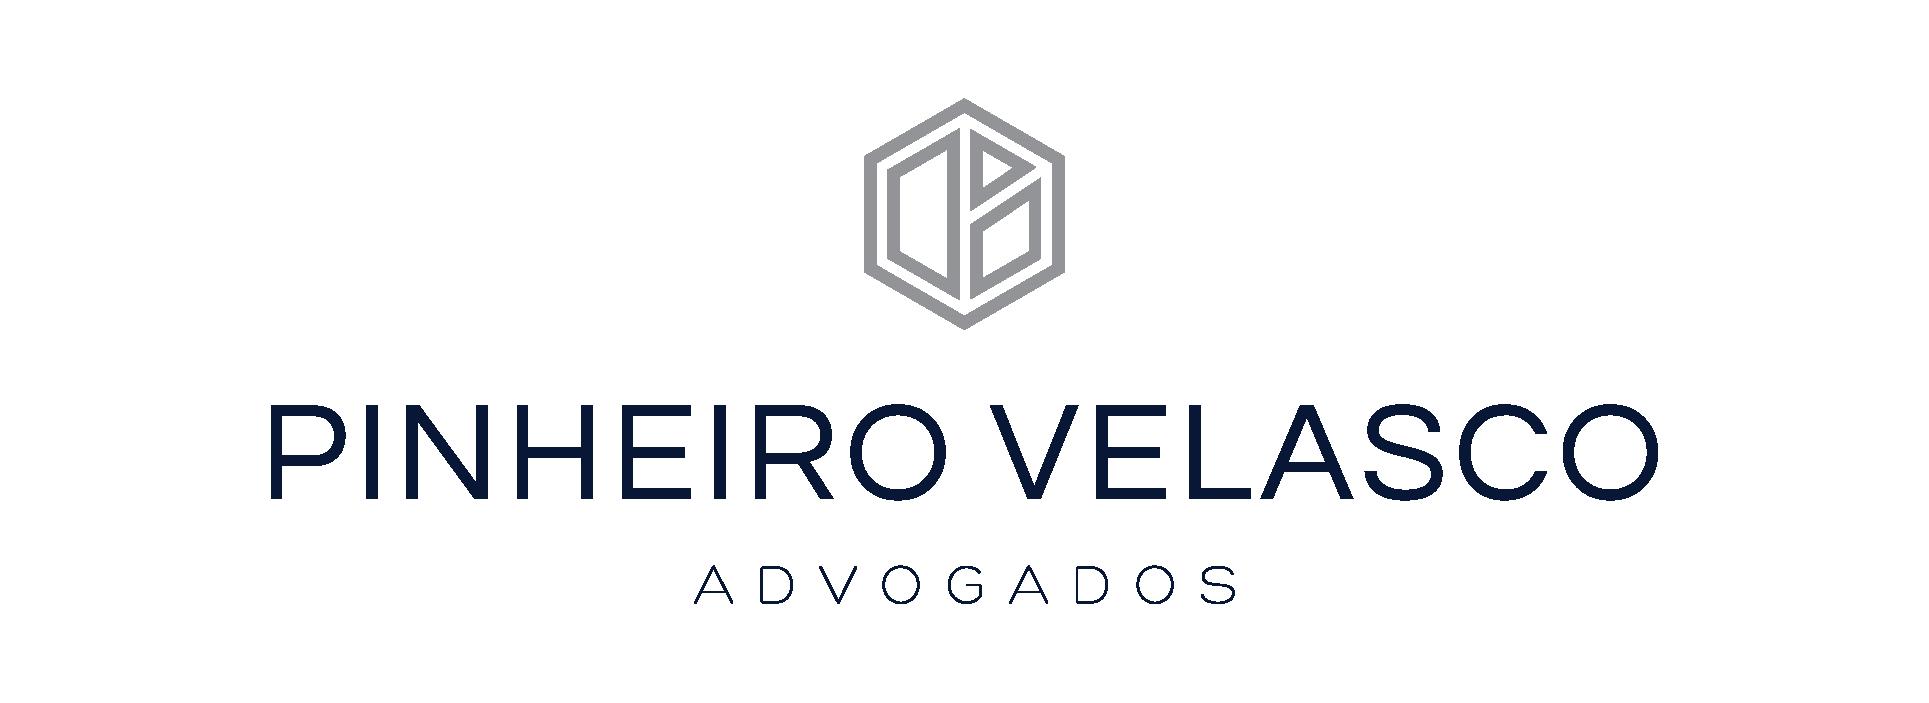 Pinheiro Velasco